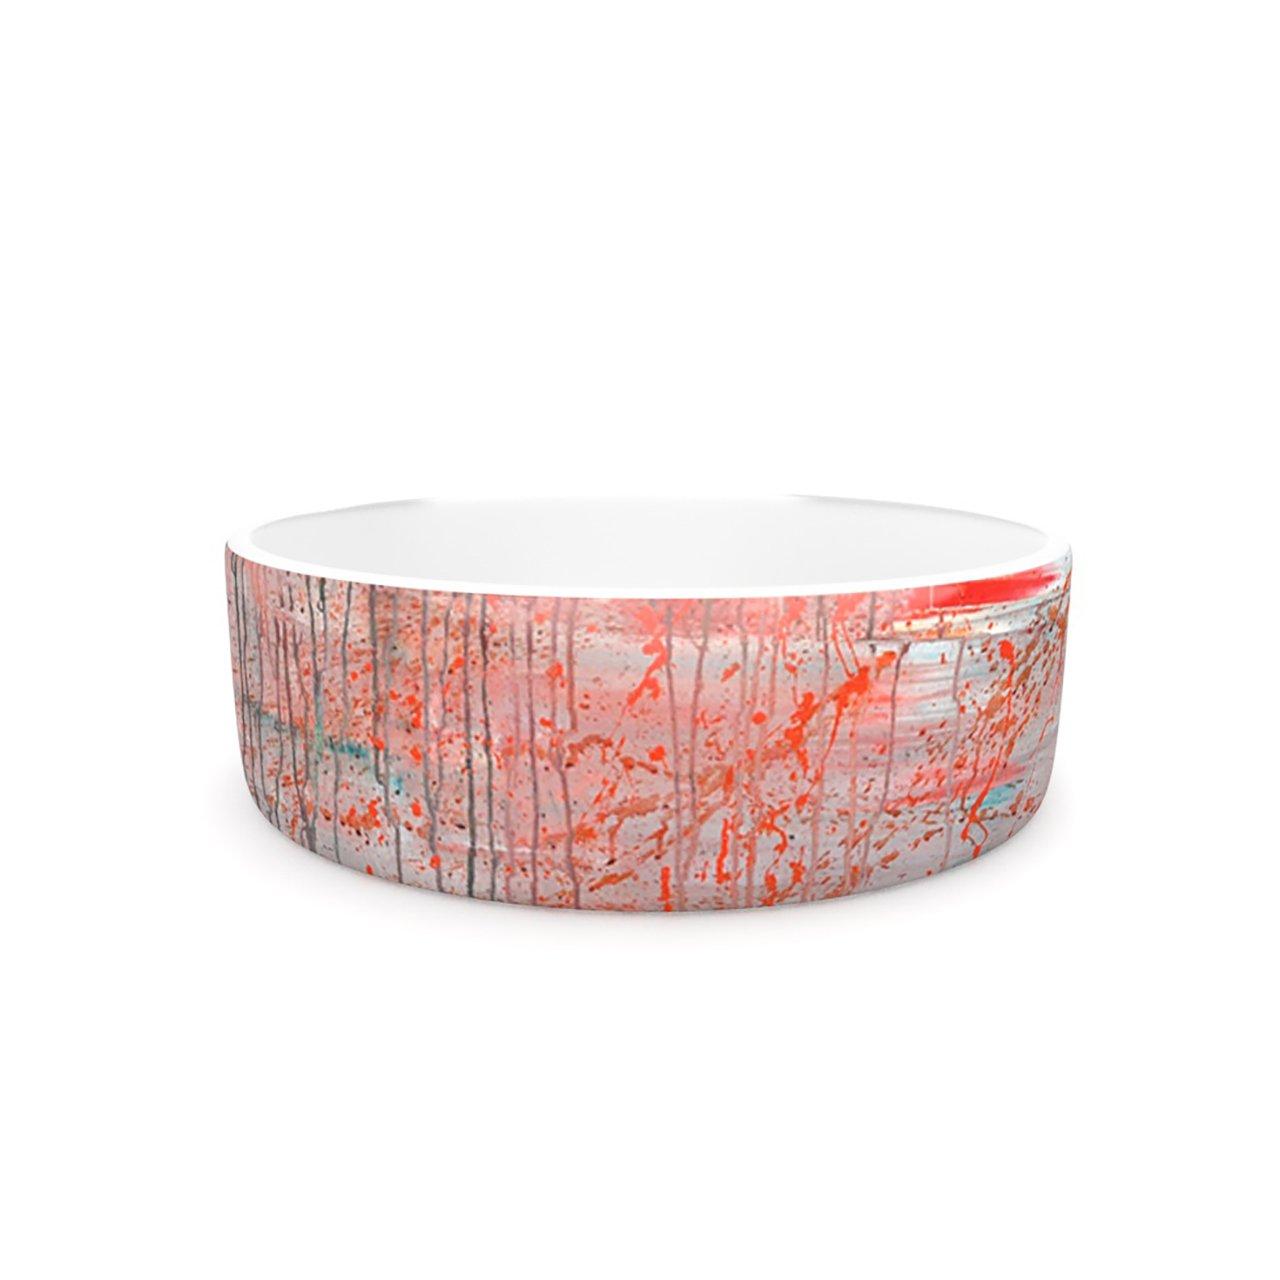 Kess InHouse Iris Lehnhardt Mots de La Terre  Pet Bowl, 7-Inch, Splatter Paint